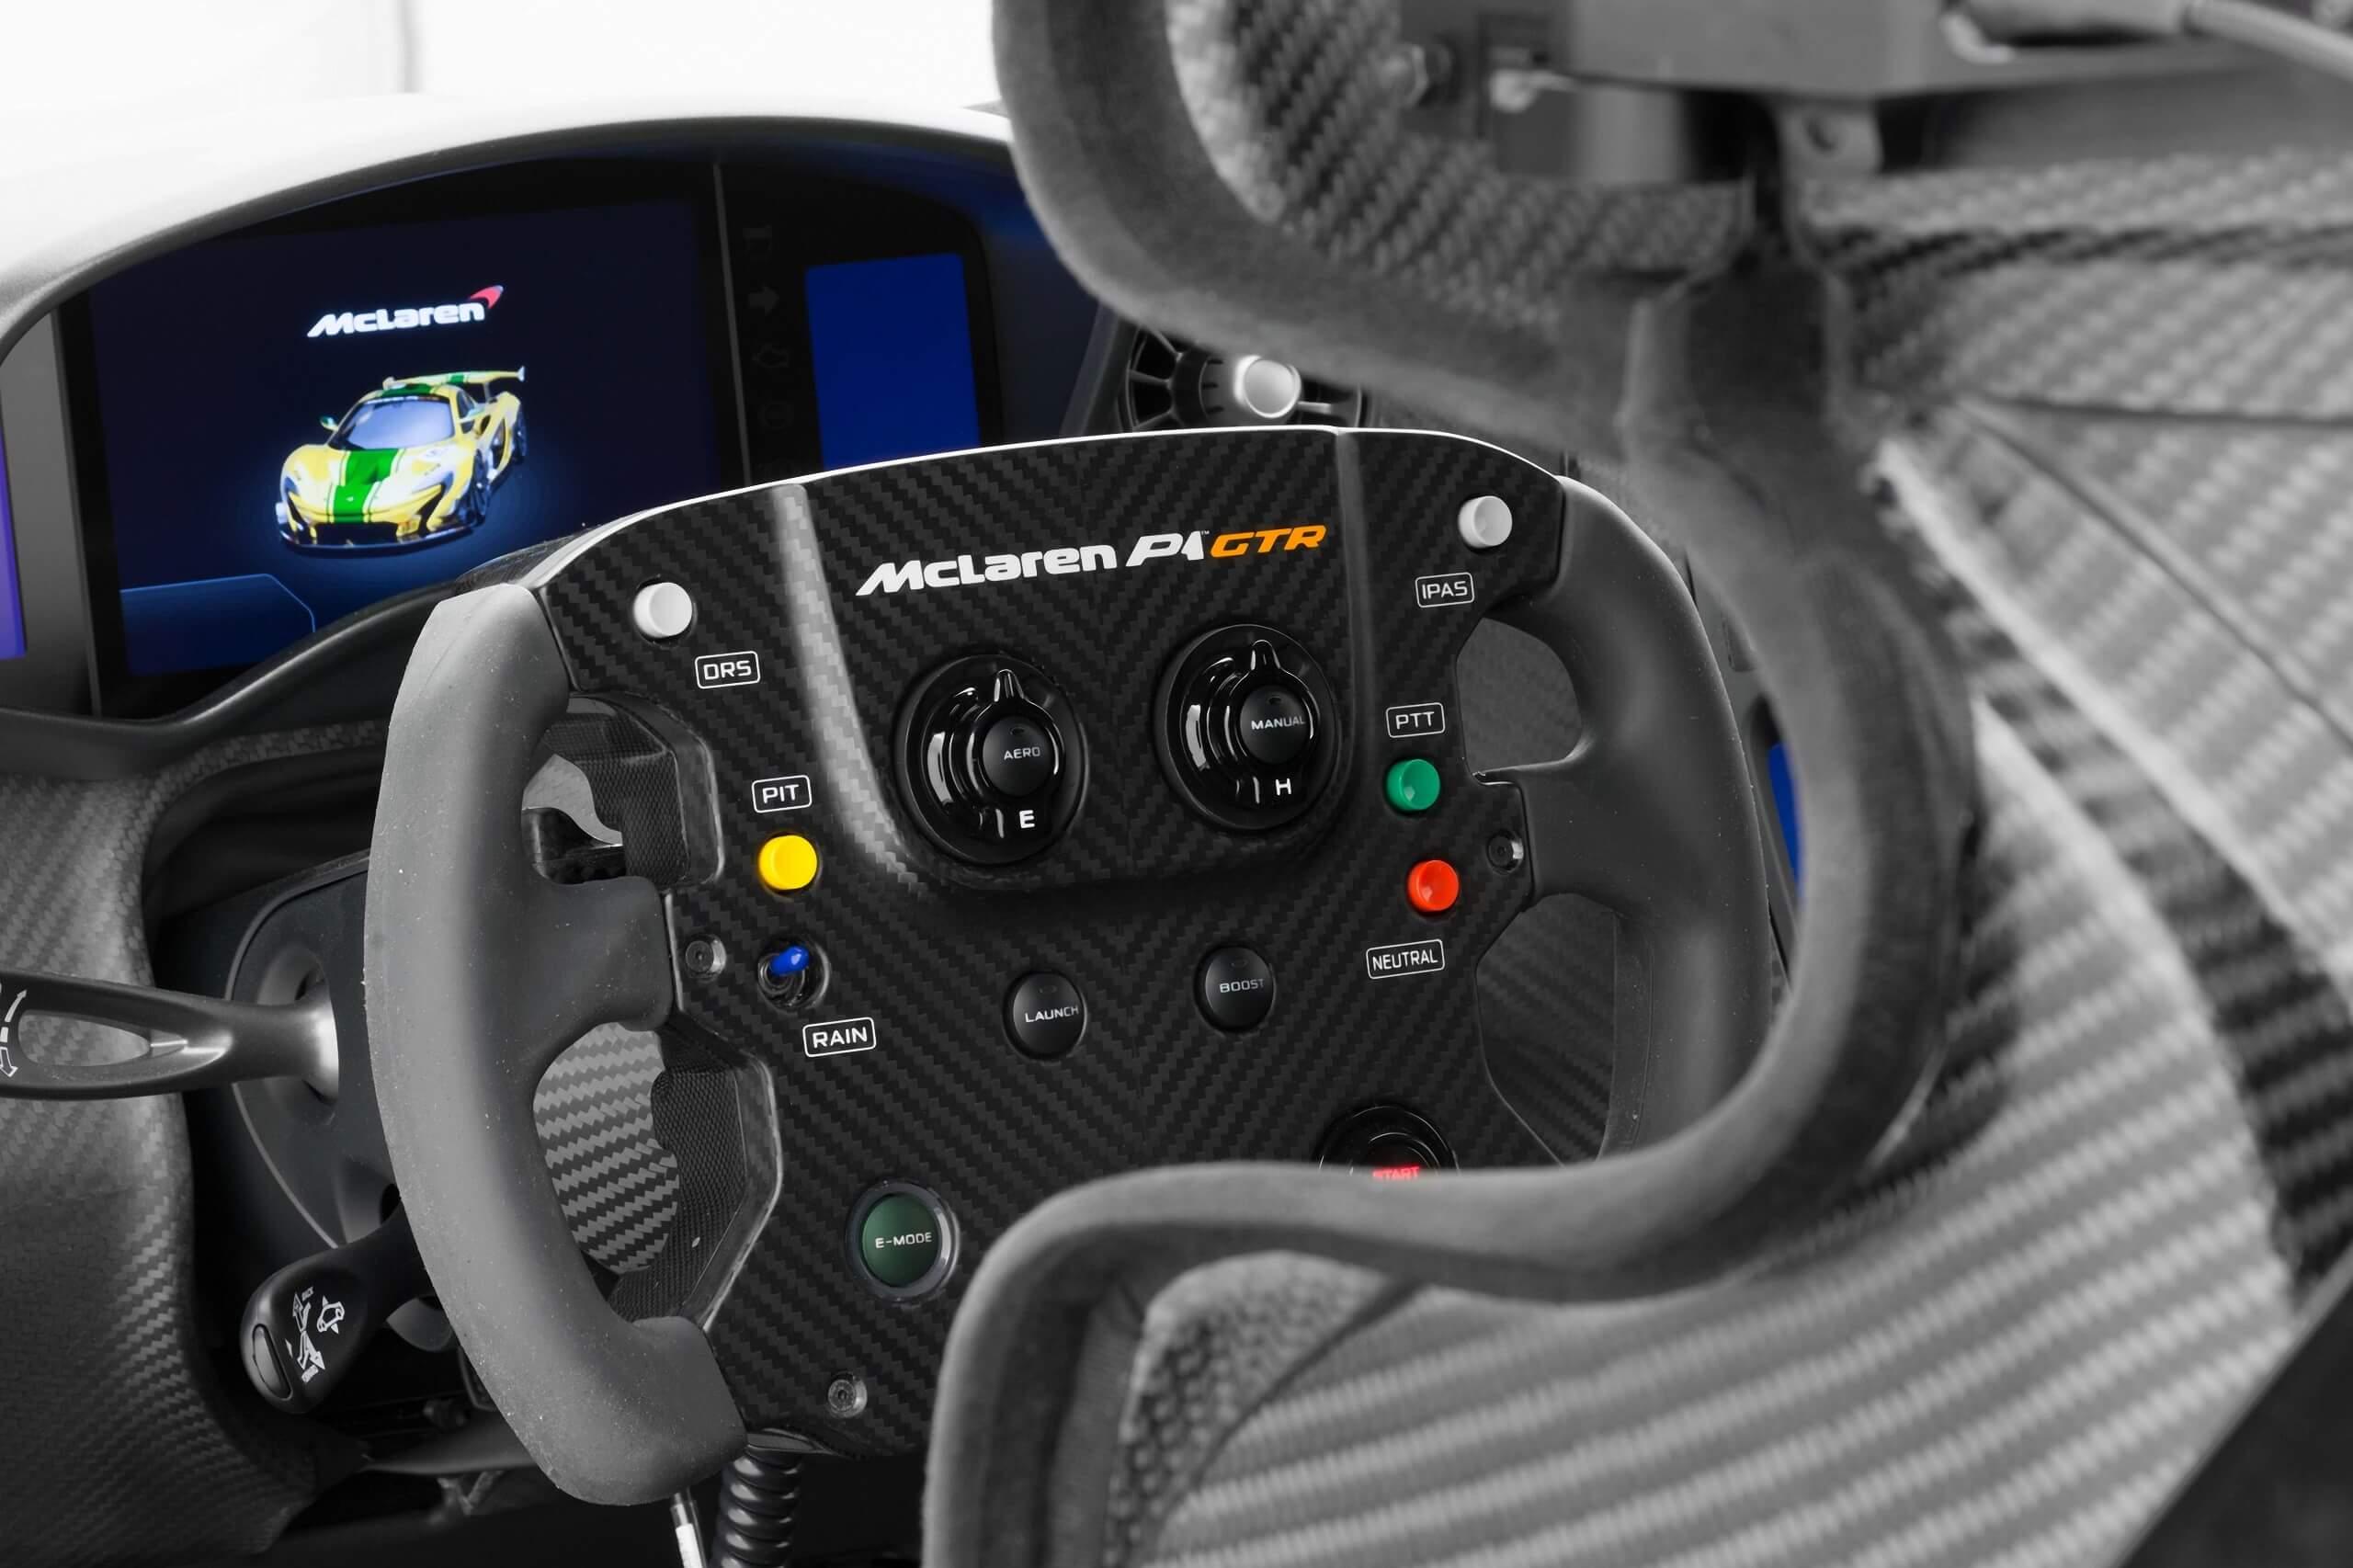 Street-legal-McLaren-P1-GTR-for-sale-14